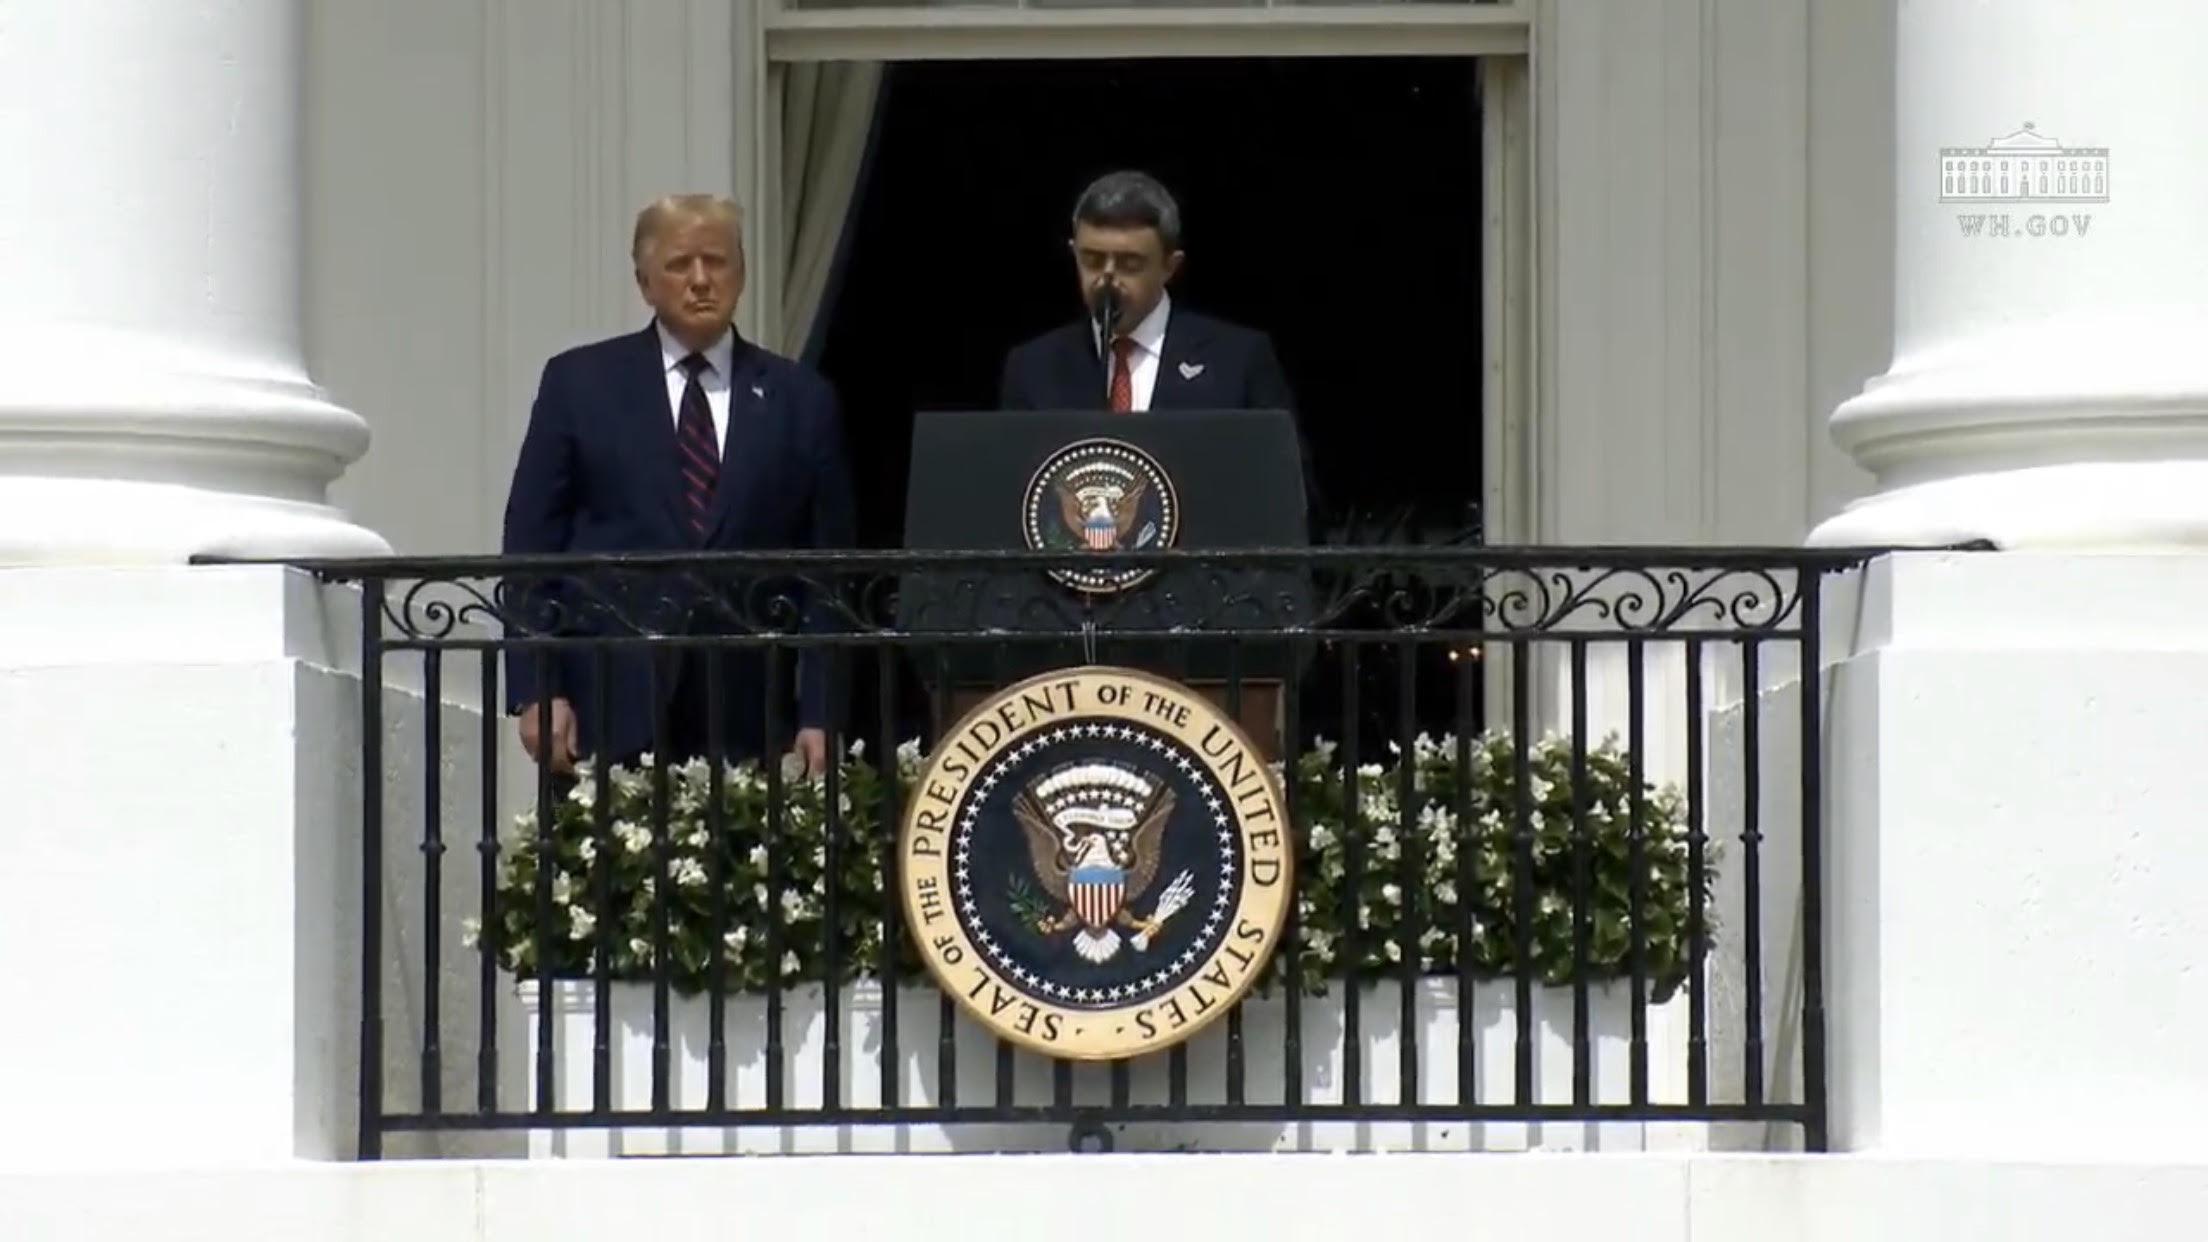 President Trump alongside UAE Foreign Minister Sheikh Abdullah Bin Zayed Al Nahyan. Screenshot/YouTube/White House